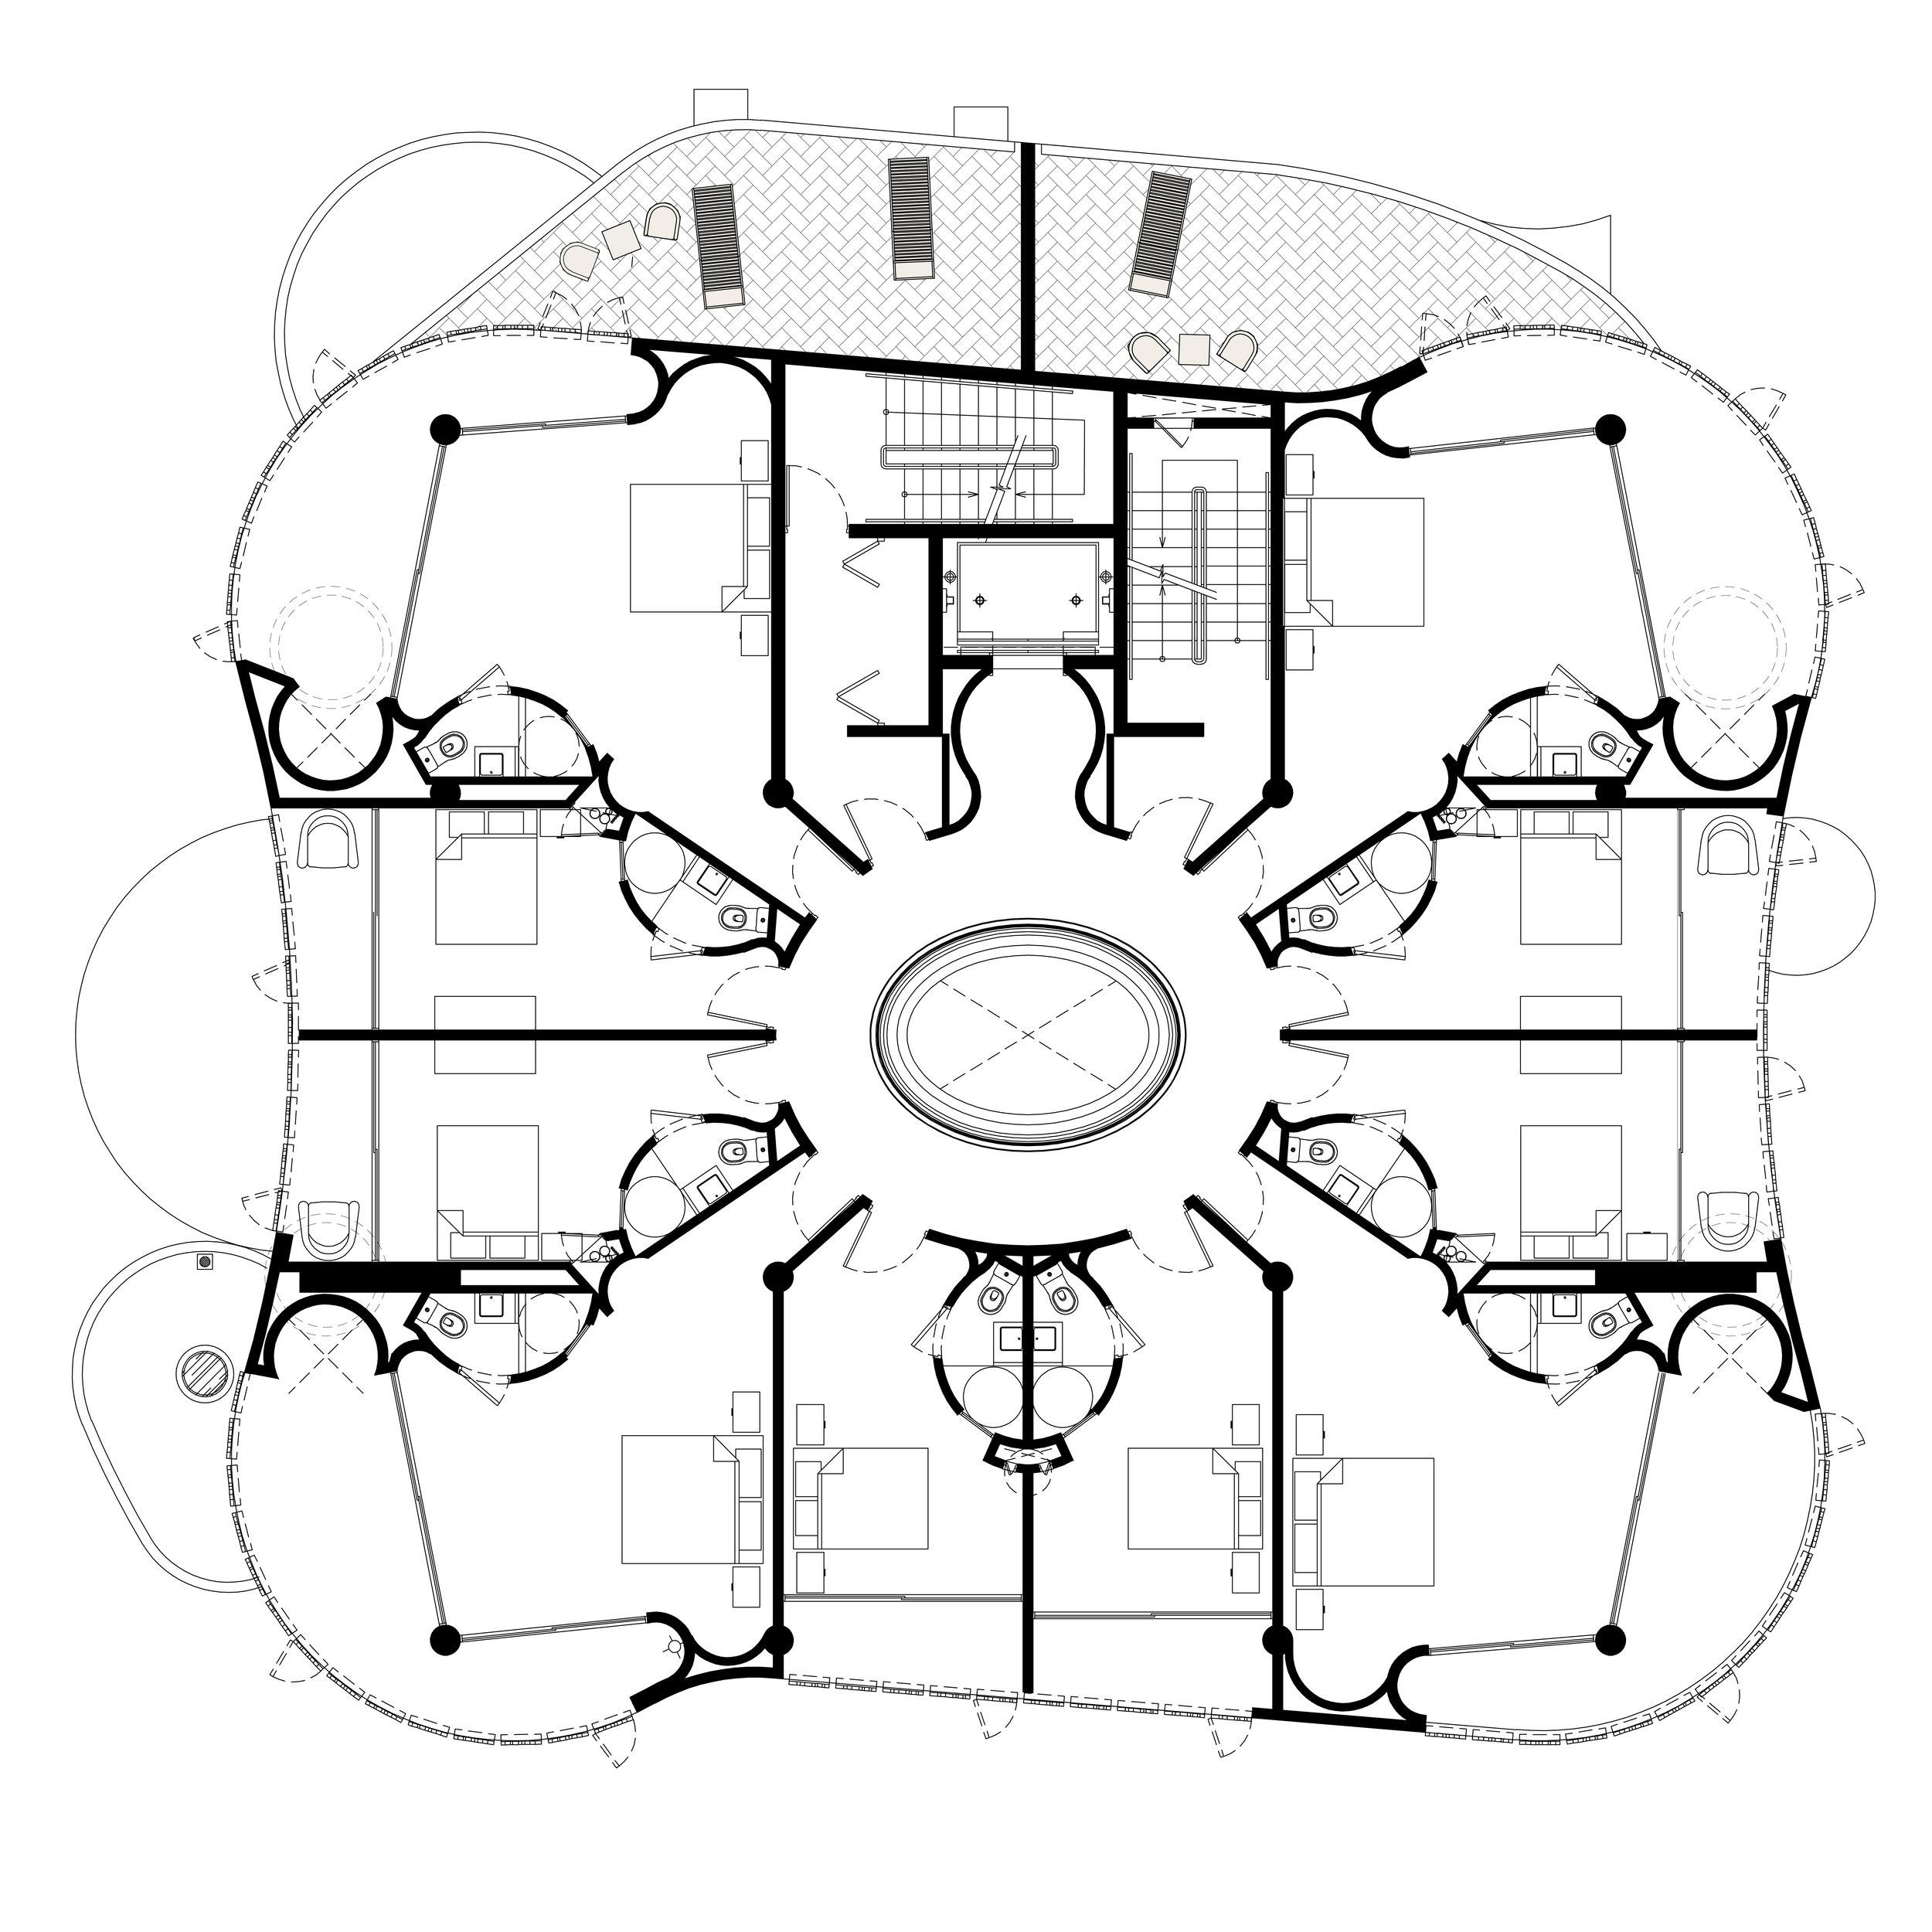 el_blok_boutique_hotel_floor_plans_vieques_puerto_rico_fuster_architects.jpg